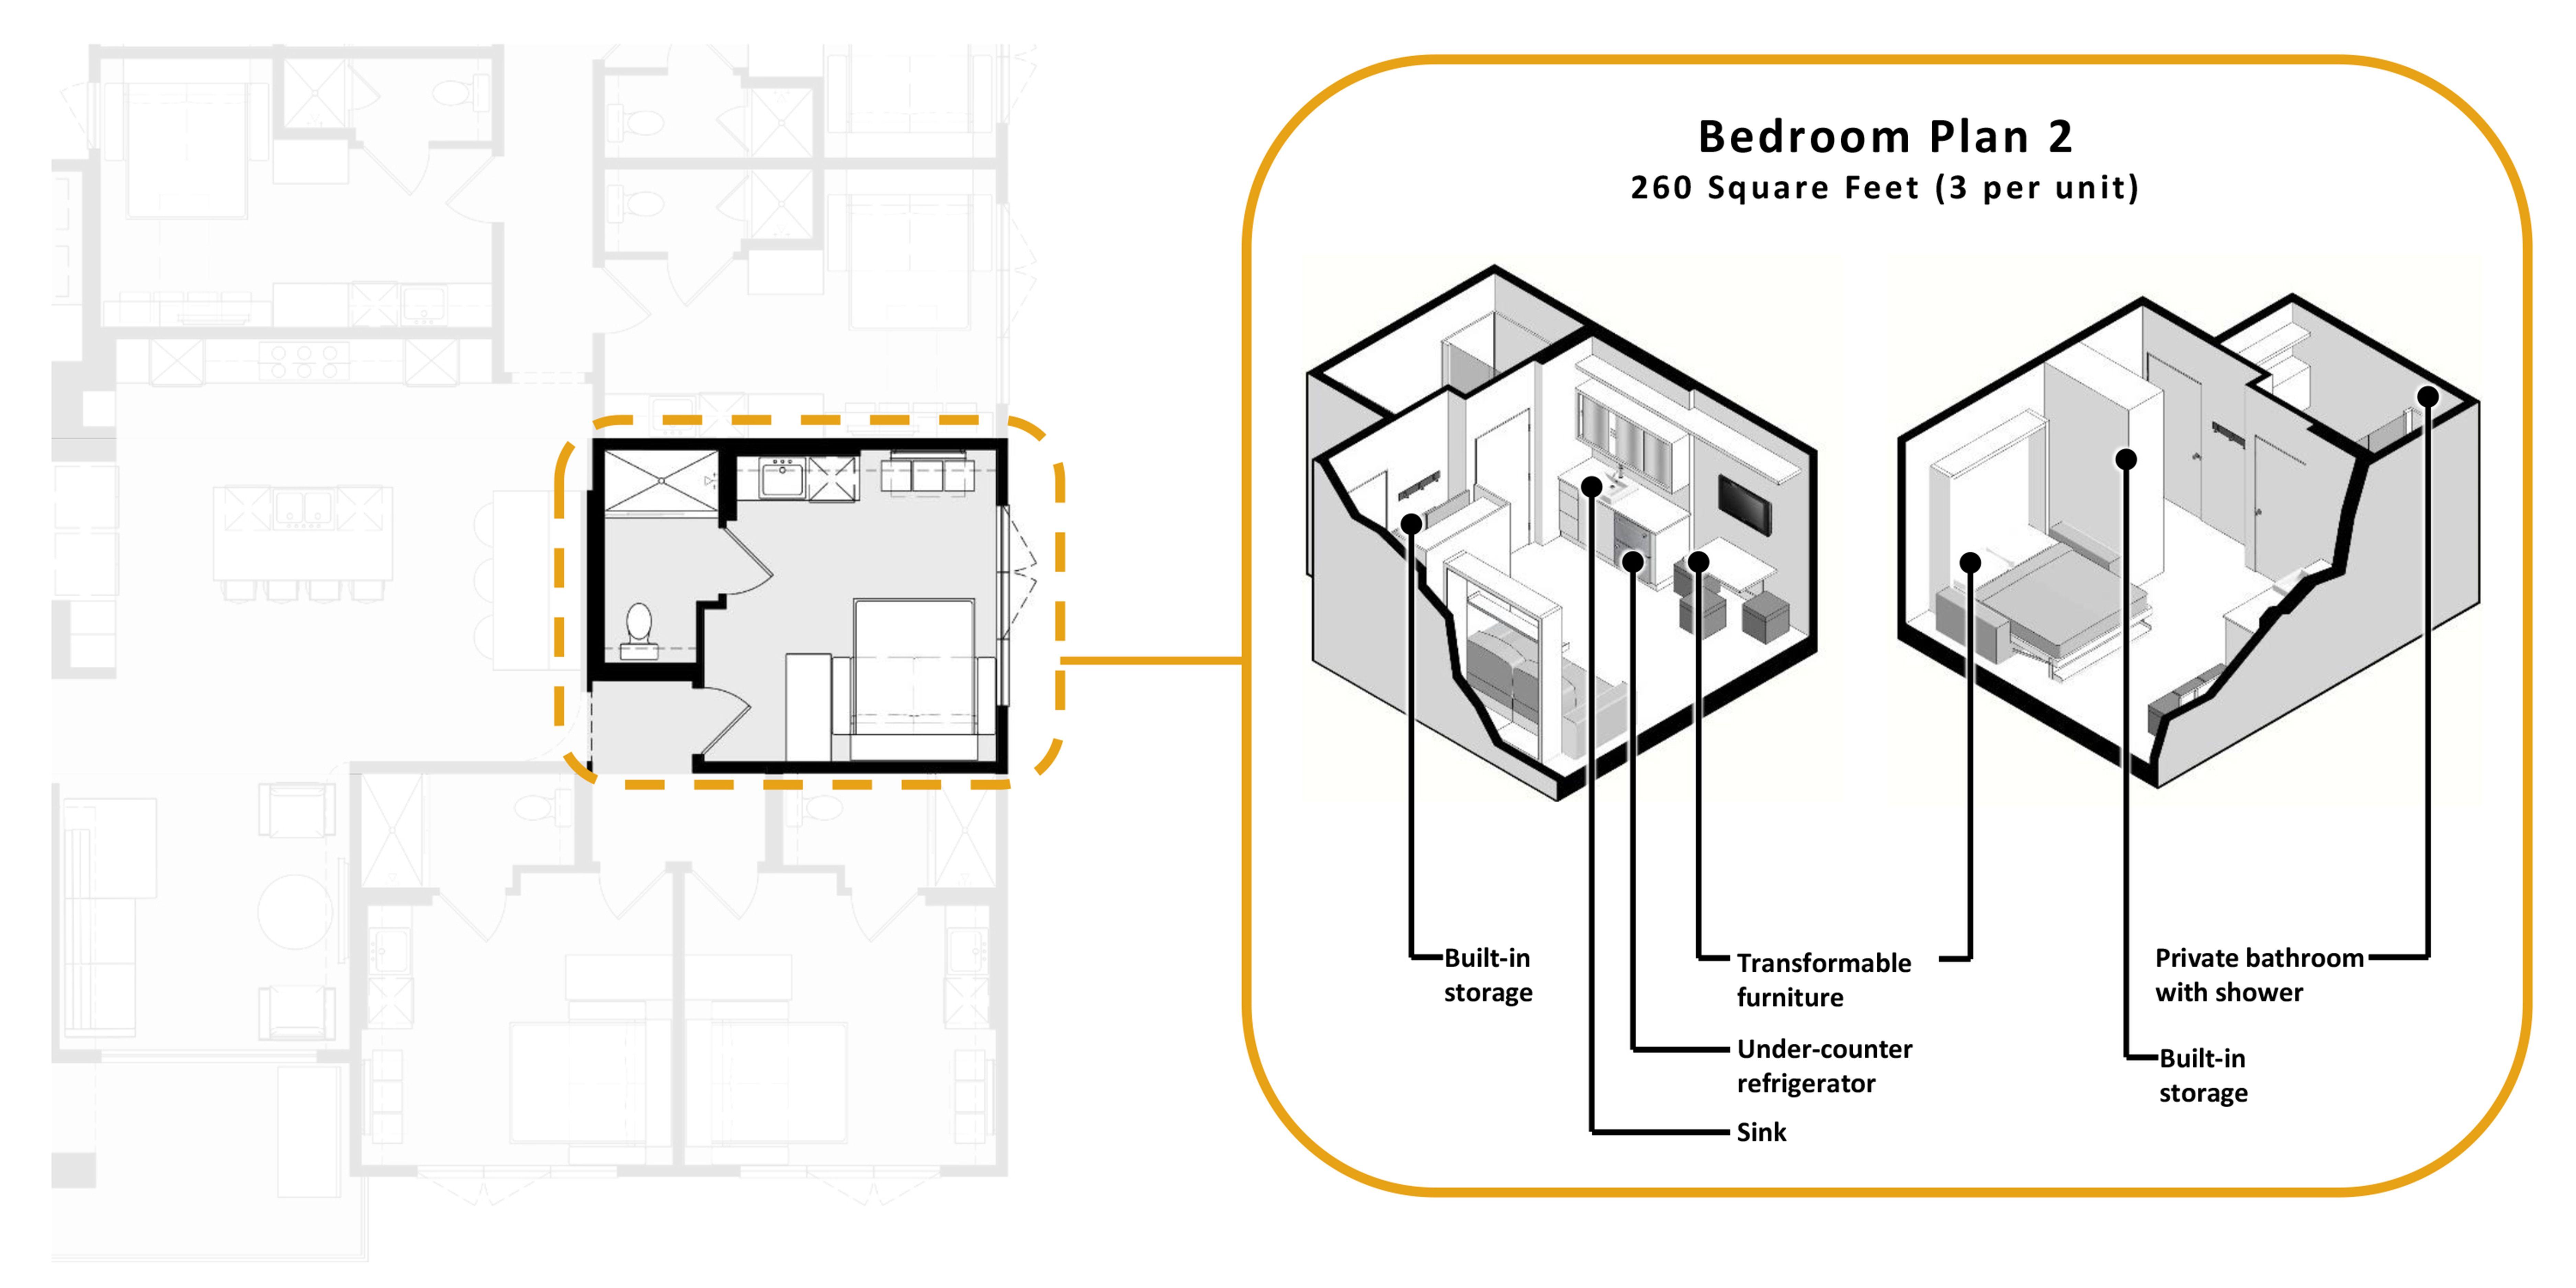 Bedroom Plan 2 Three Per Unit At 260 Square Feet This Bedroom